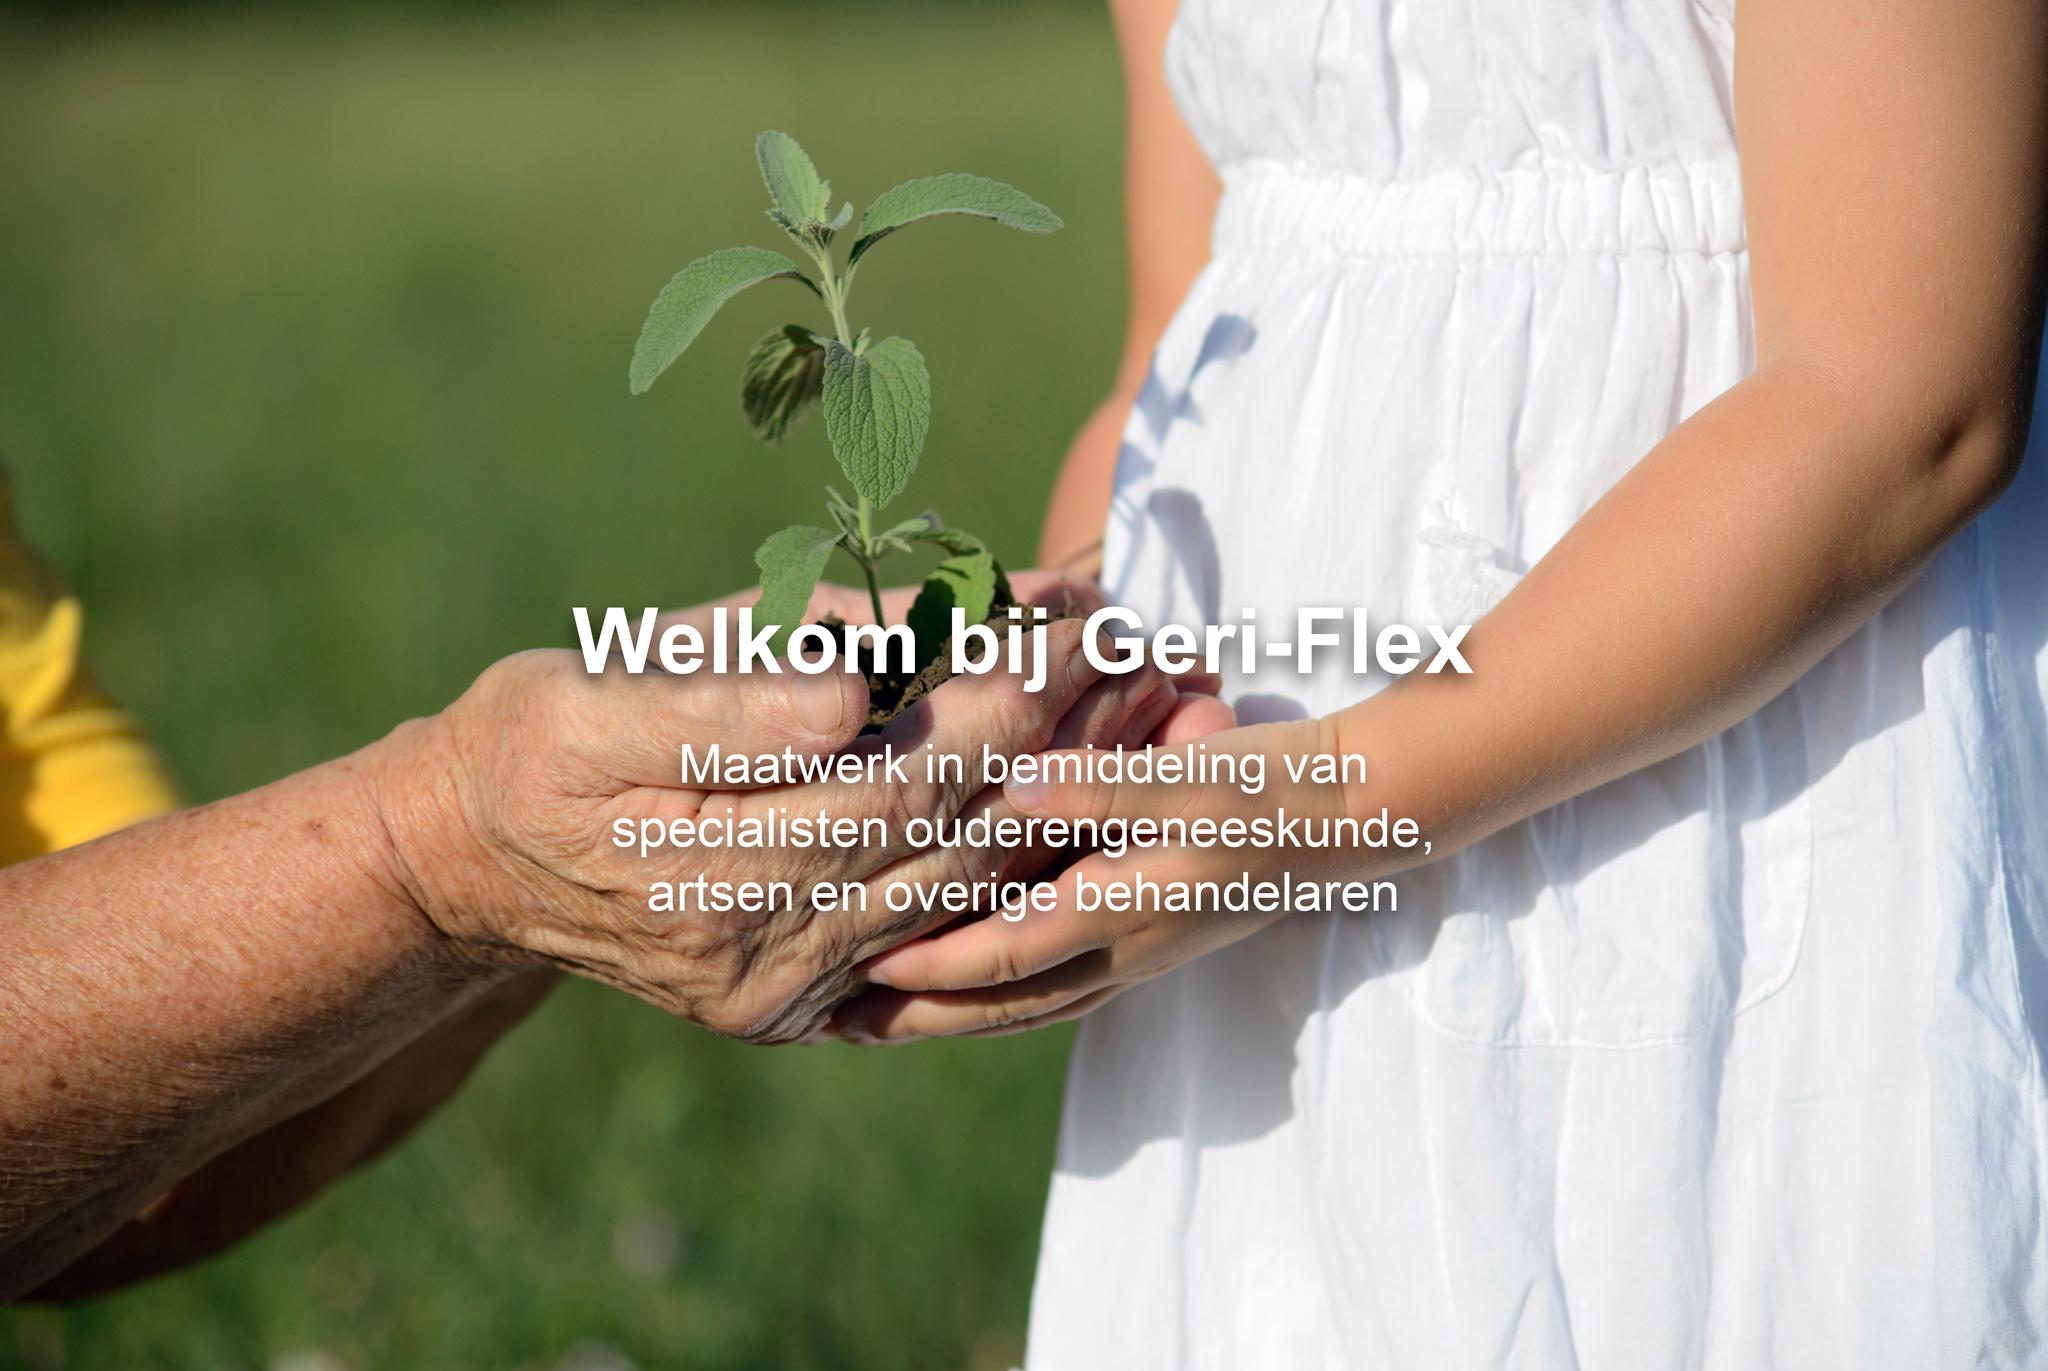 Geri-Flex_Slide01